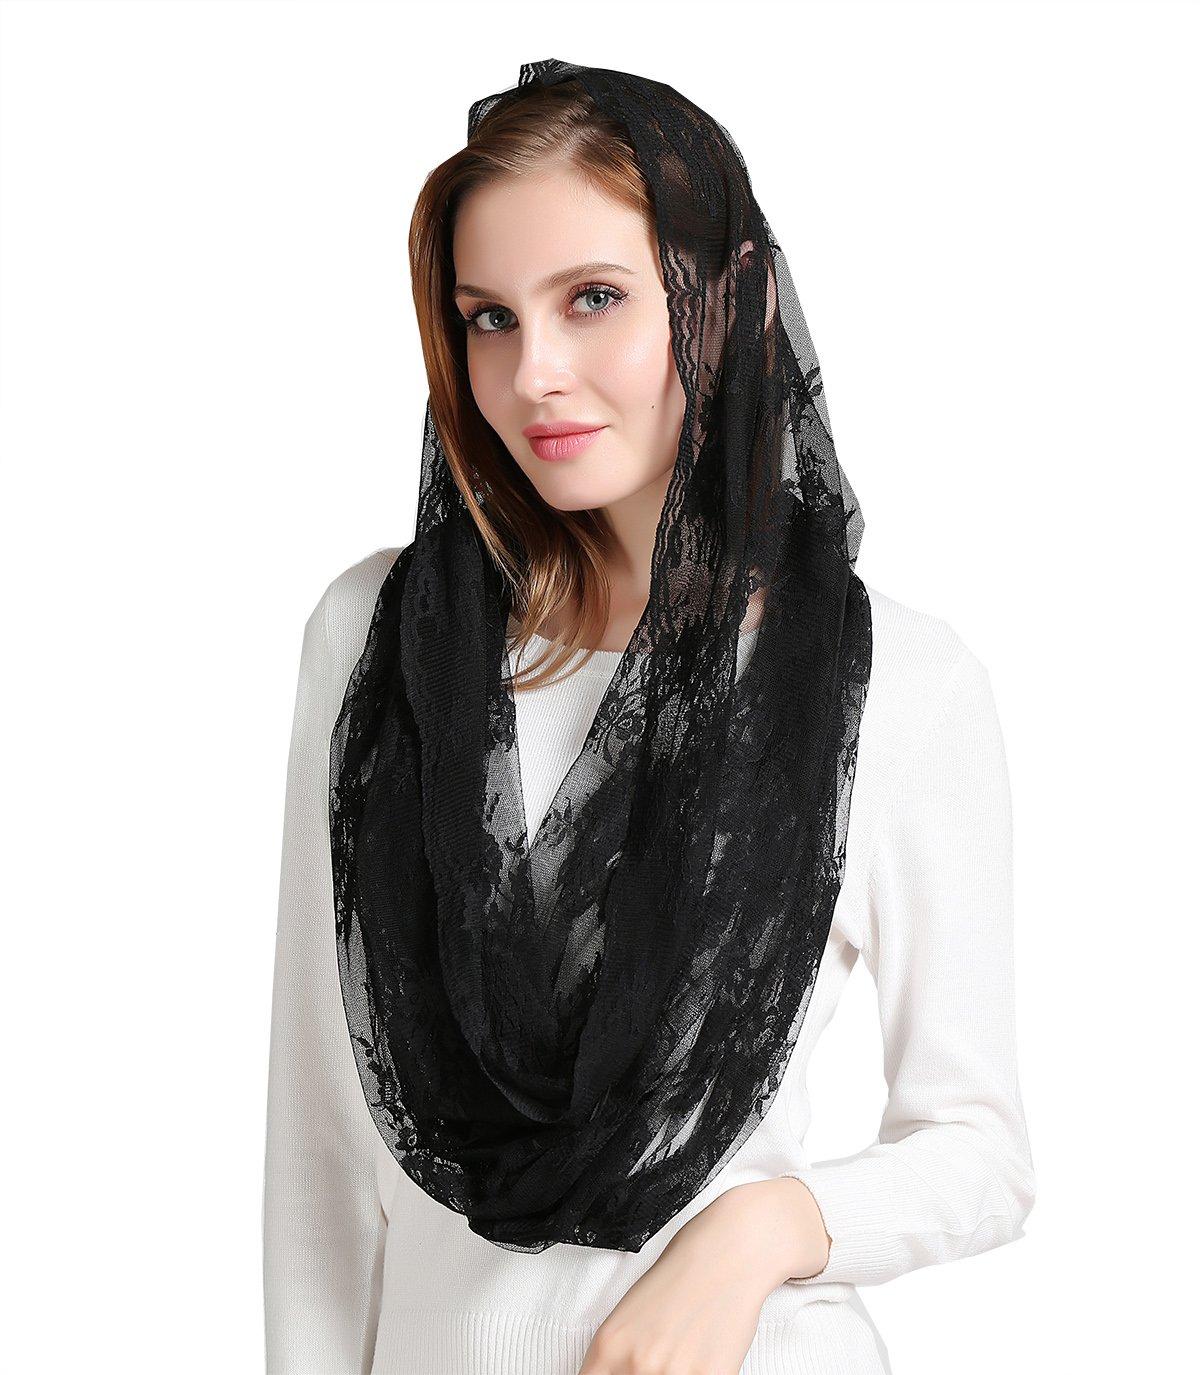 Lemandy Catholic chapel veil infinity scarf mantilla floral black lace veil v42 (Wrap)